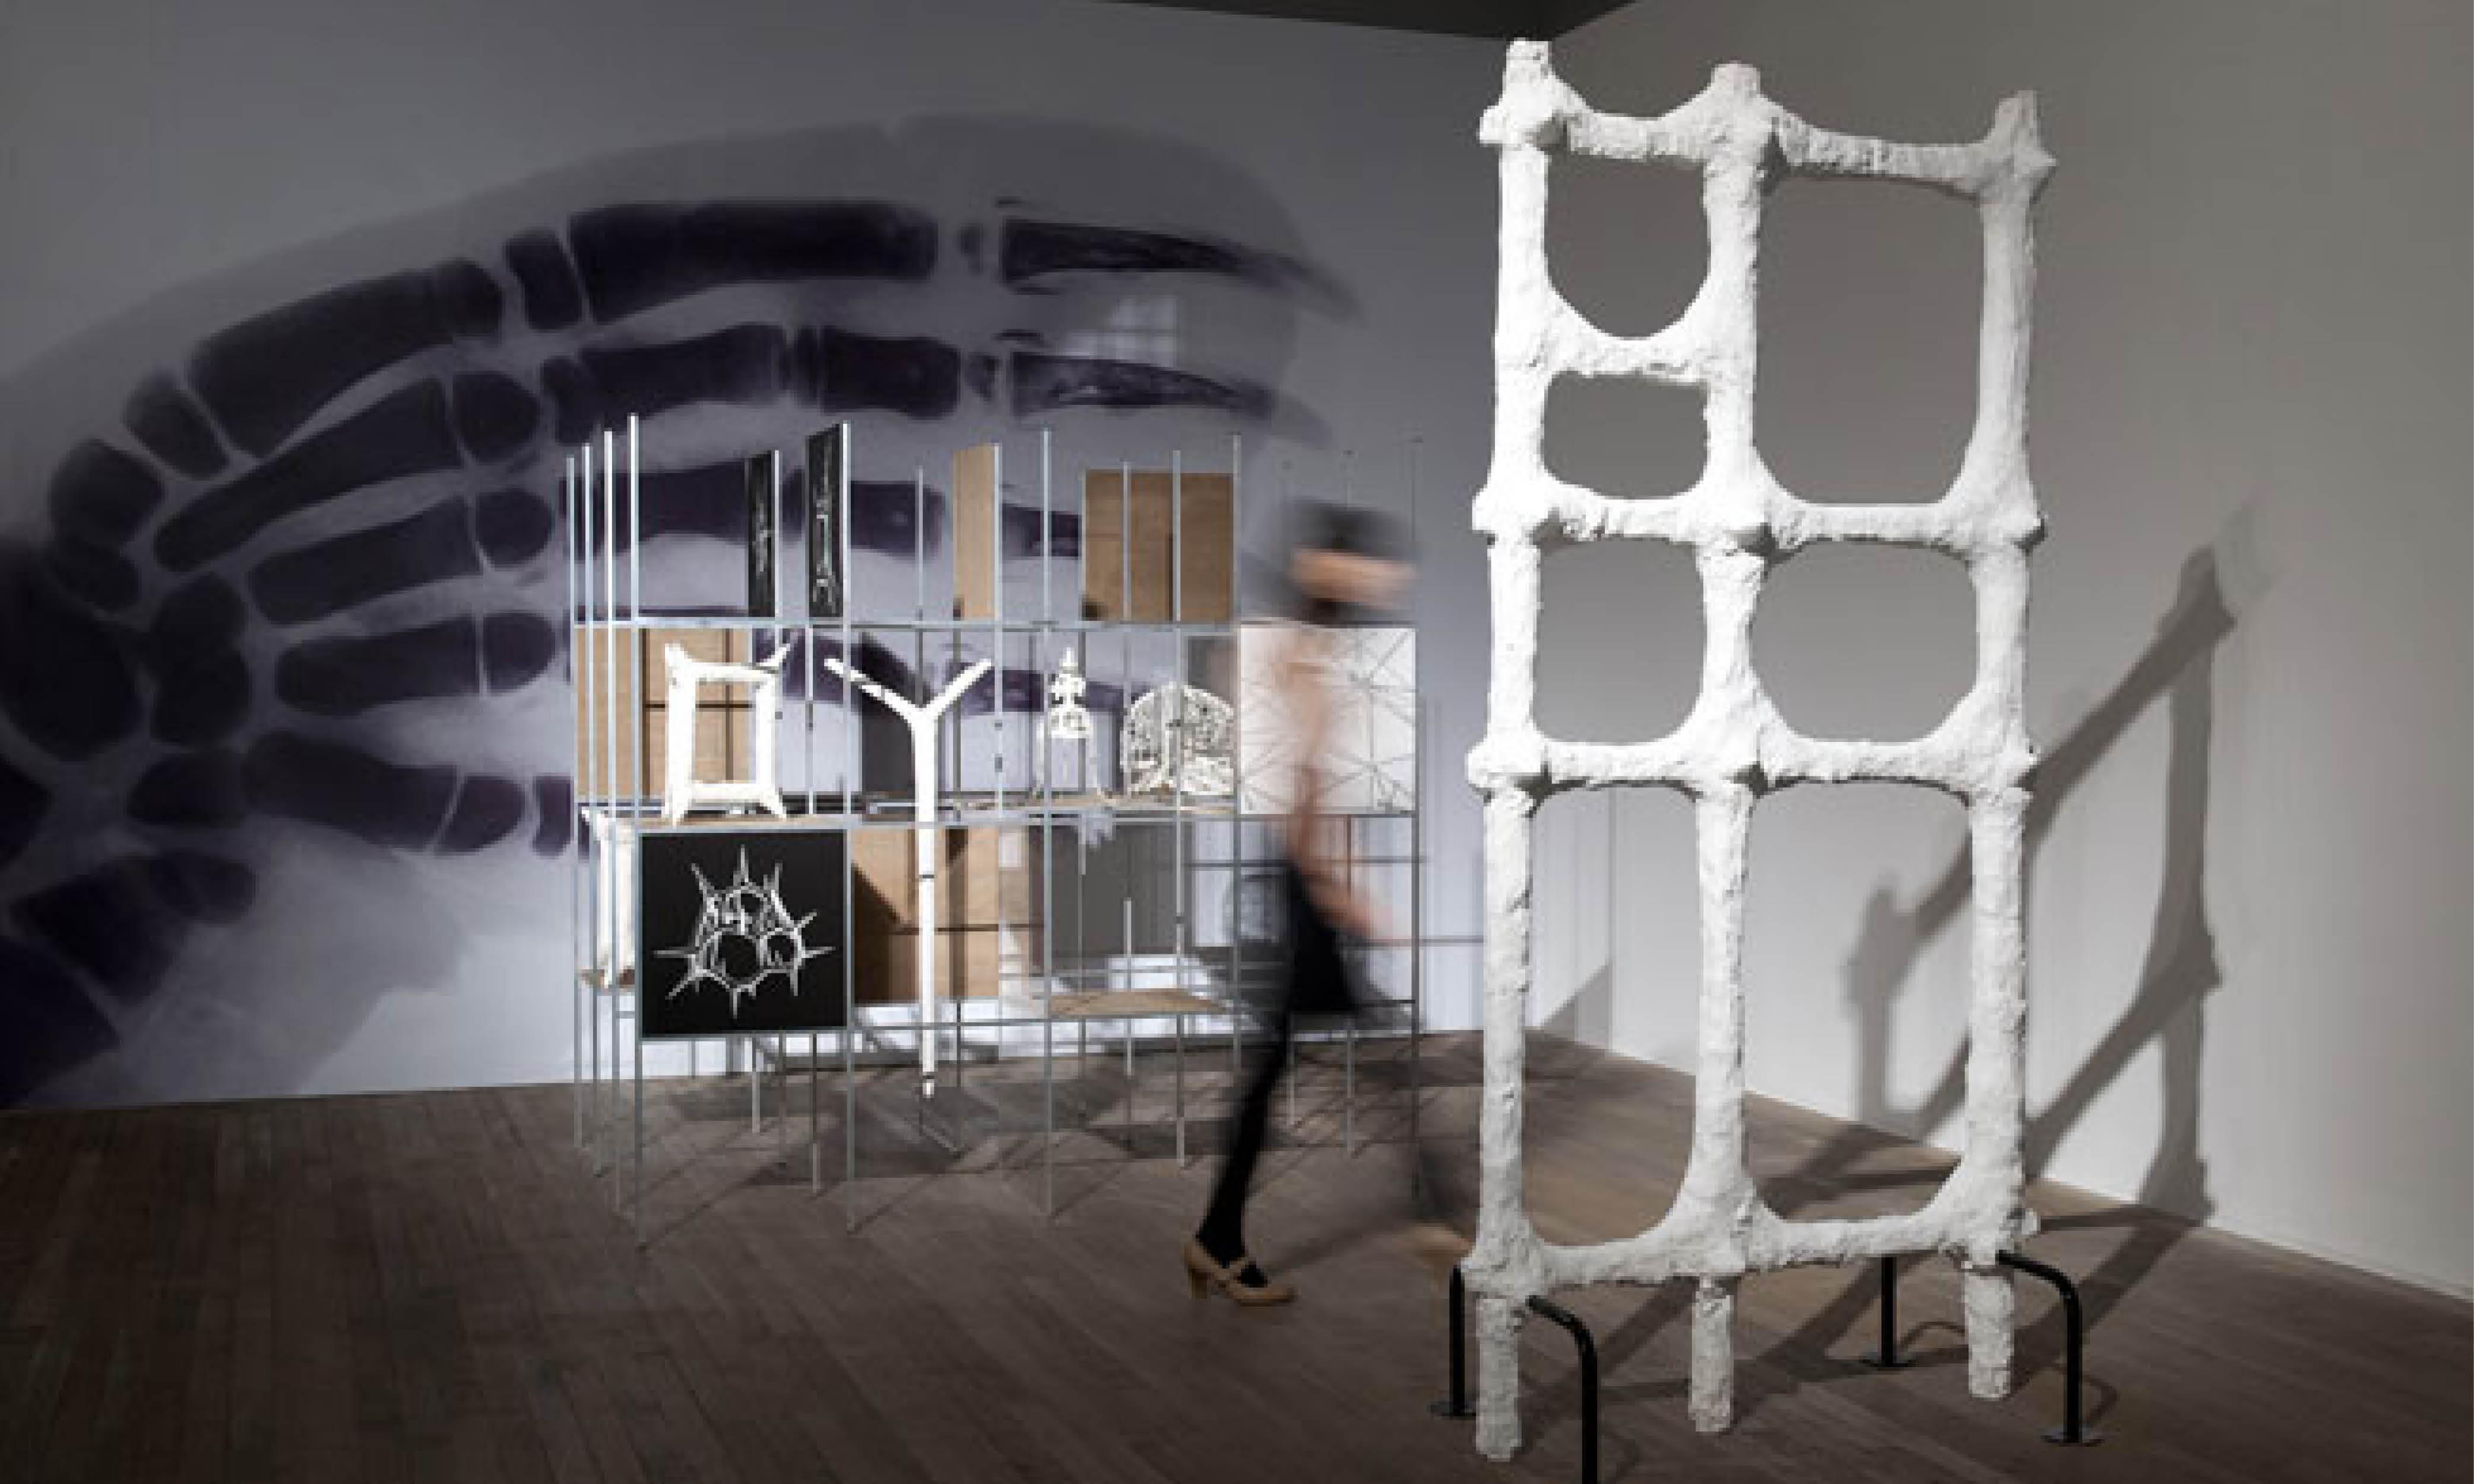 Richard Hamilton exhibition build and installation, Tate Modern thumbnail